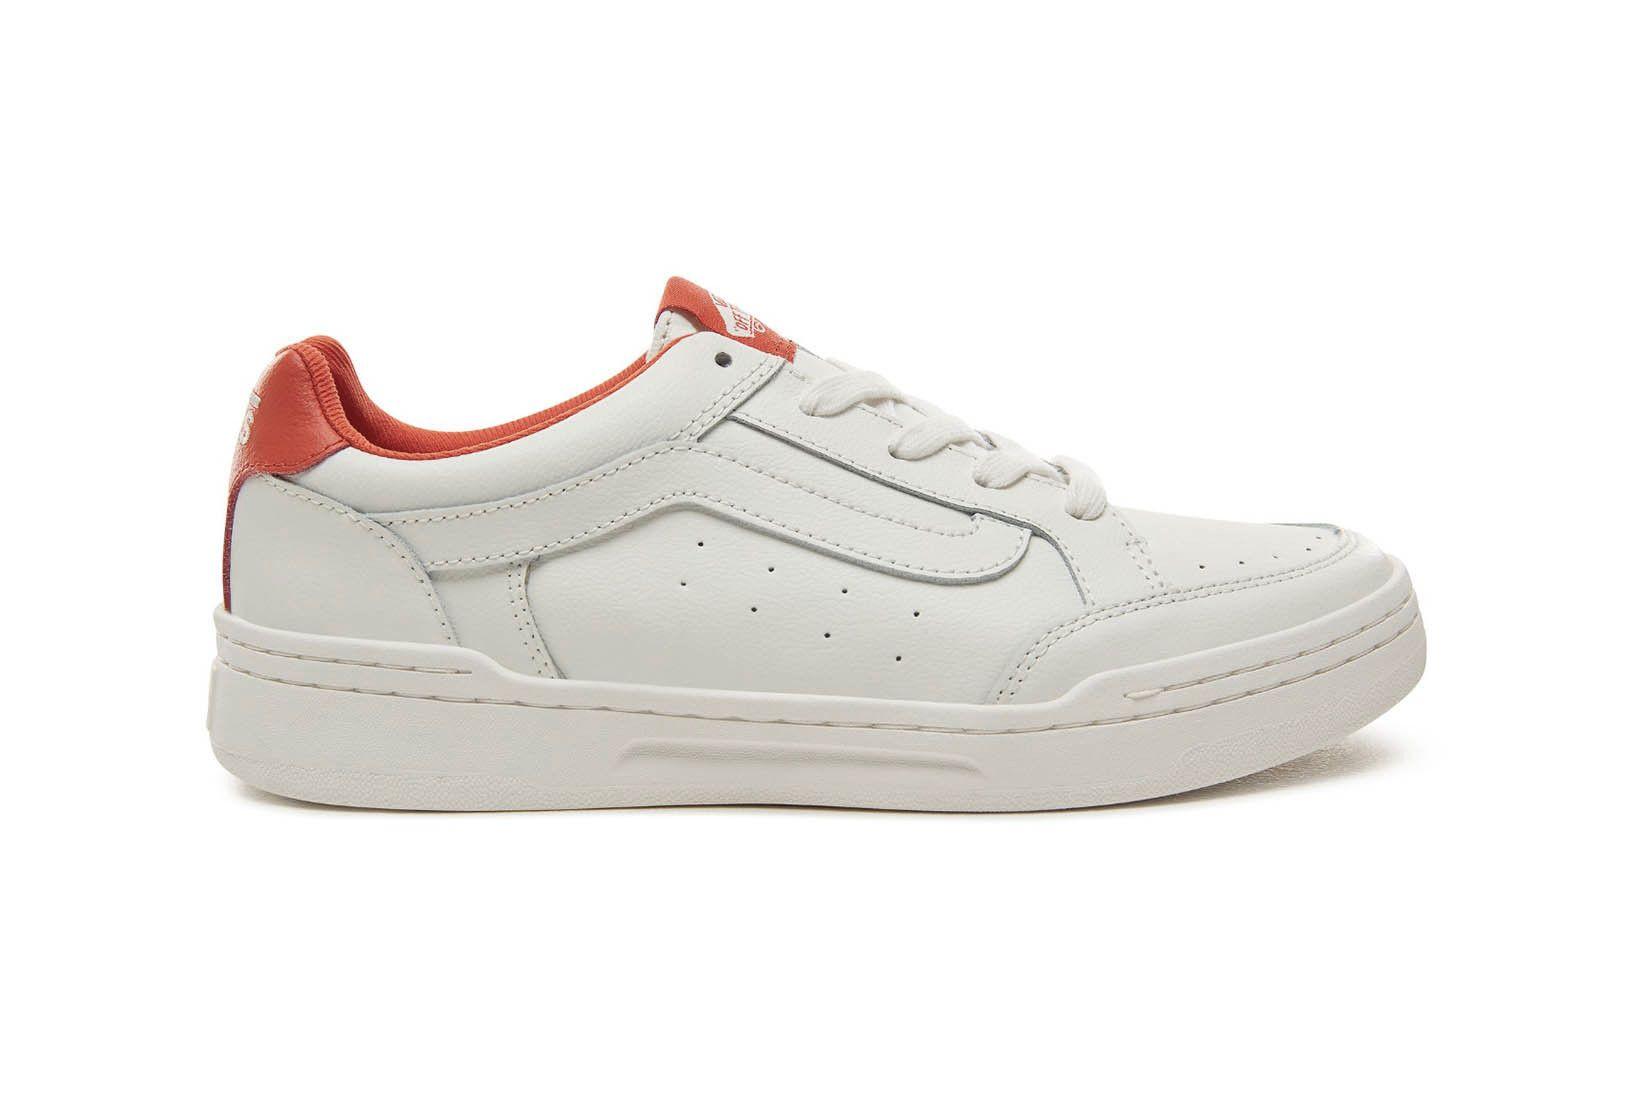 Vans Sporty Highland Pink Zephyr White Sneakers 2 Sneaker Freaker